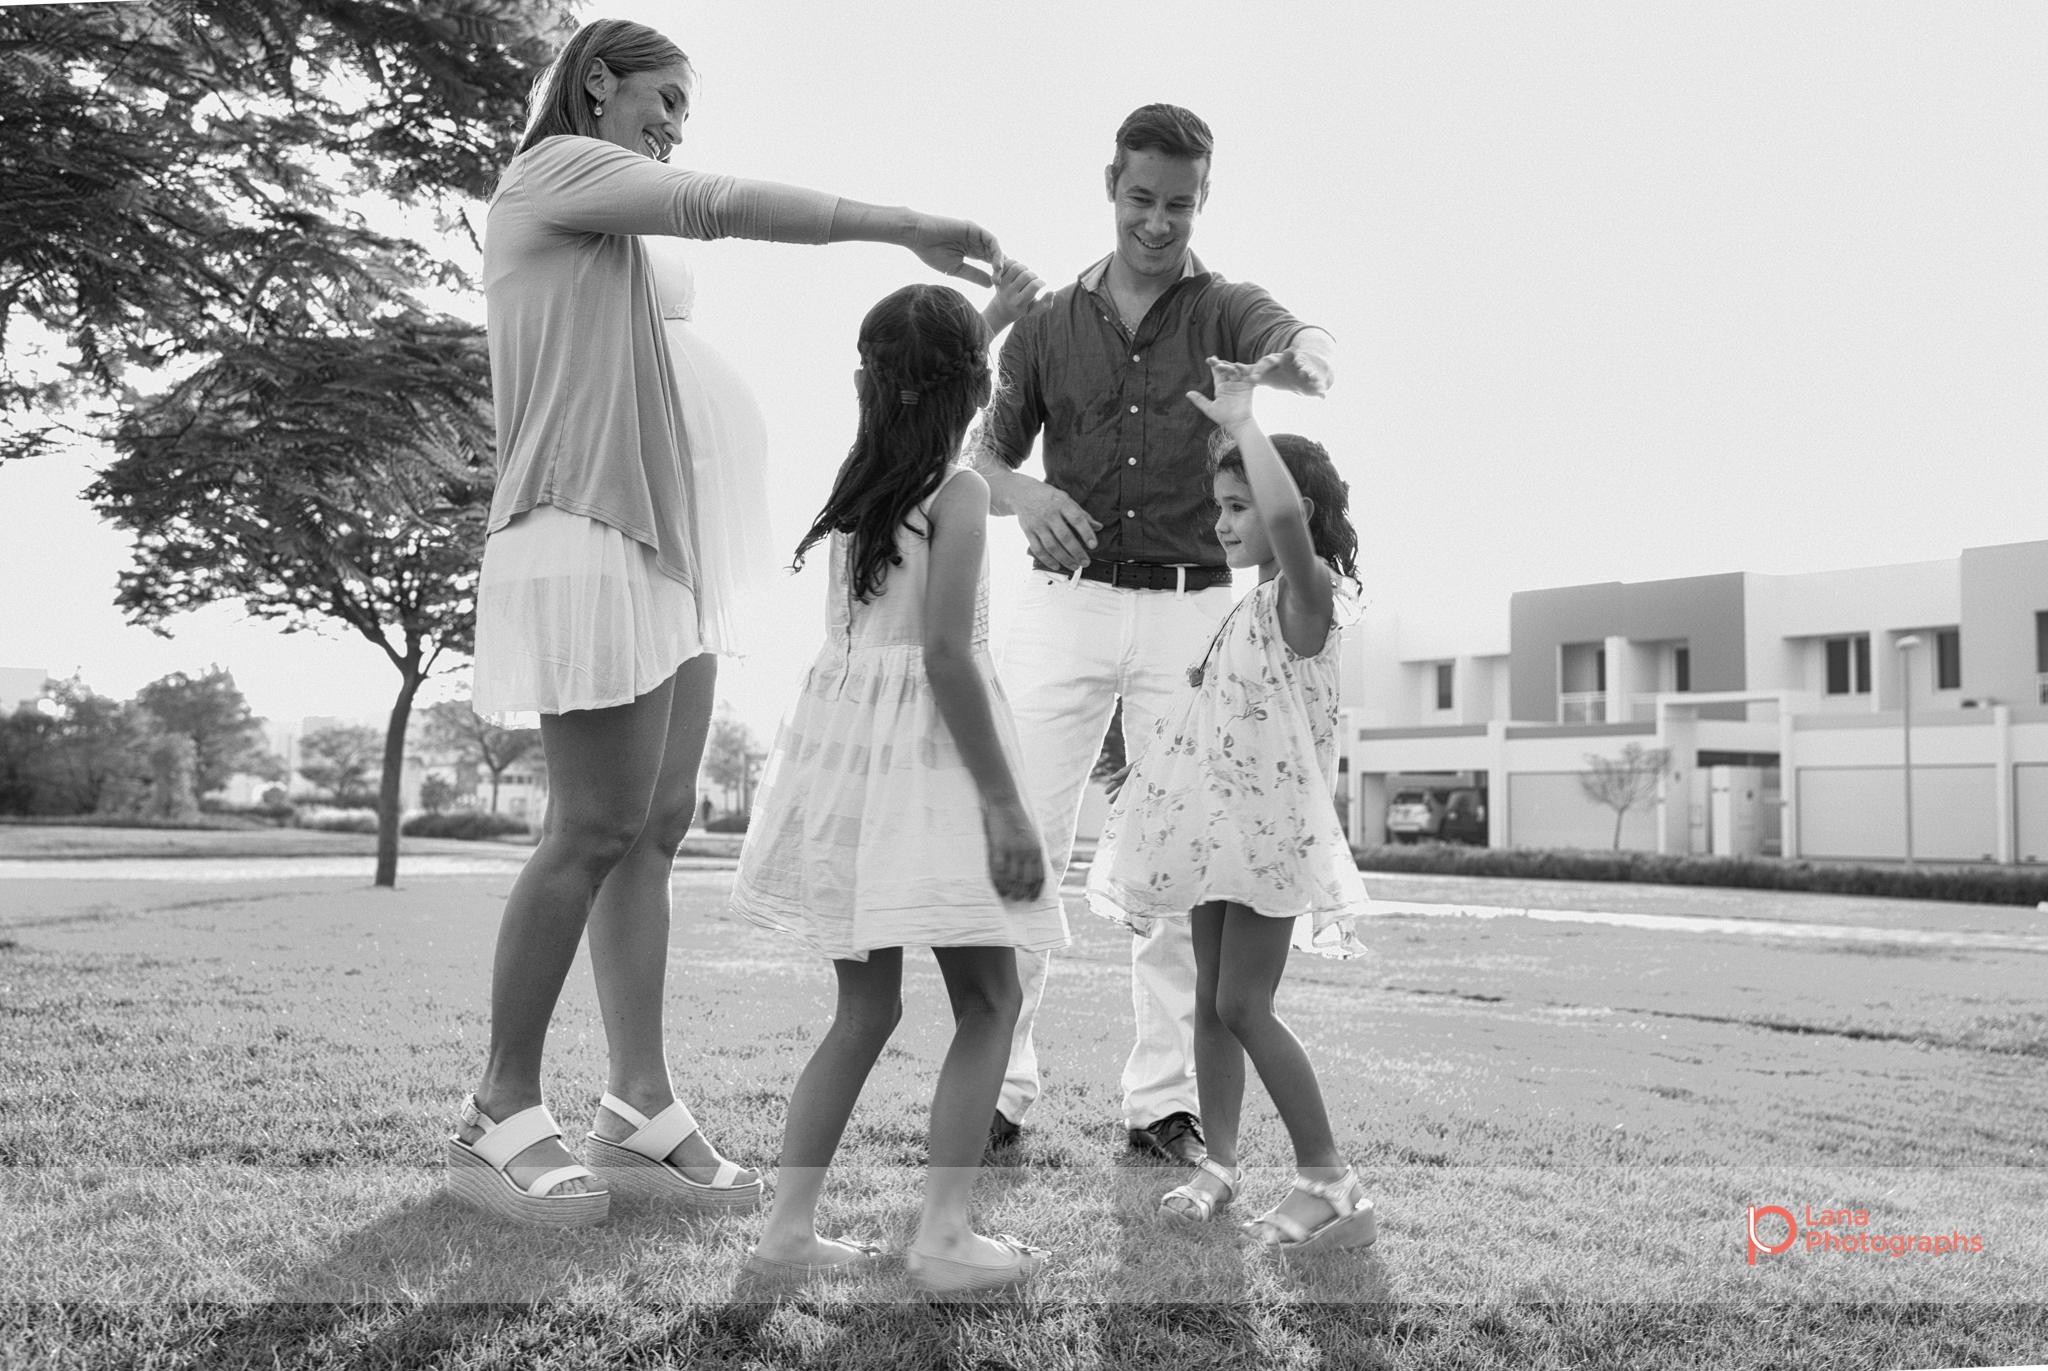 Lana-Photographs-Dubai-Family-Photography-Mayra-02.jpg